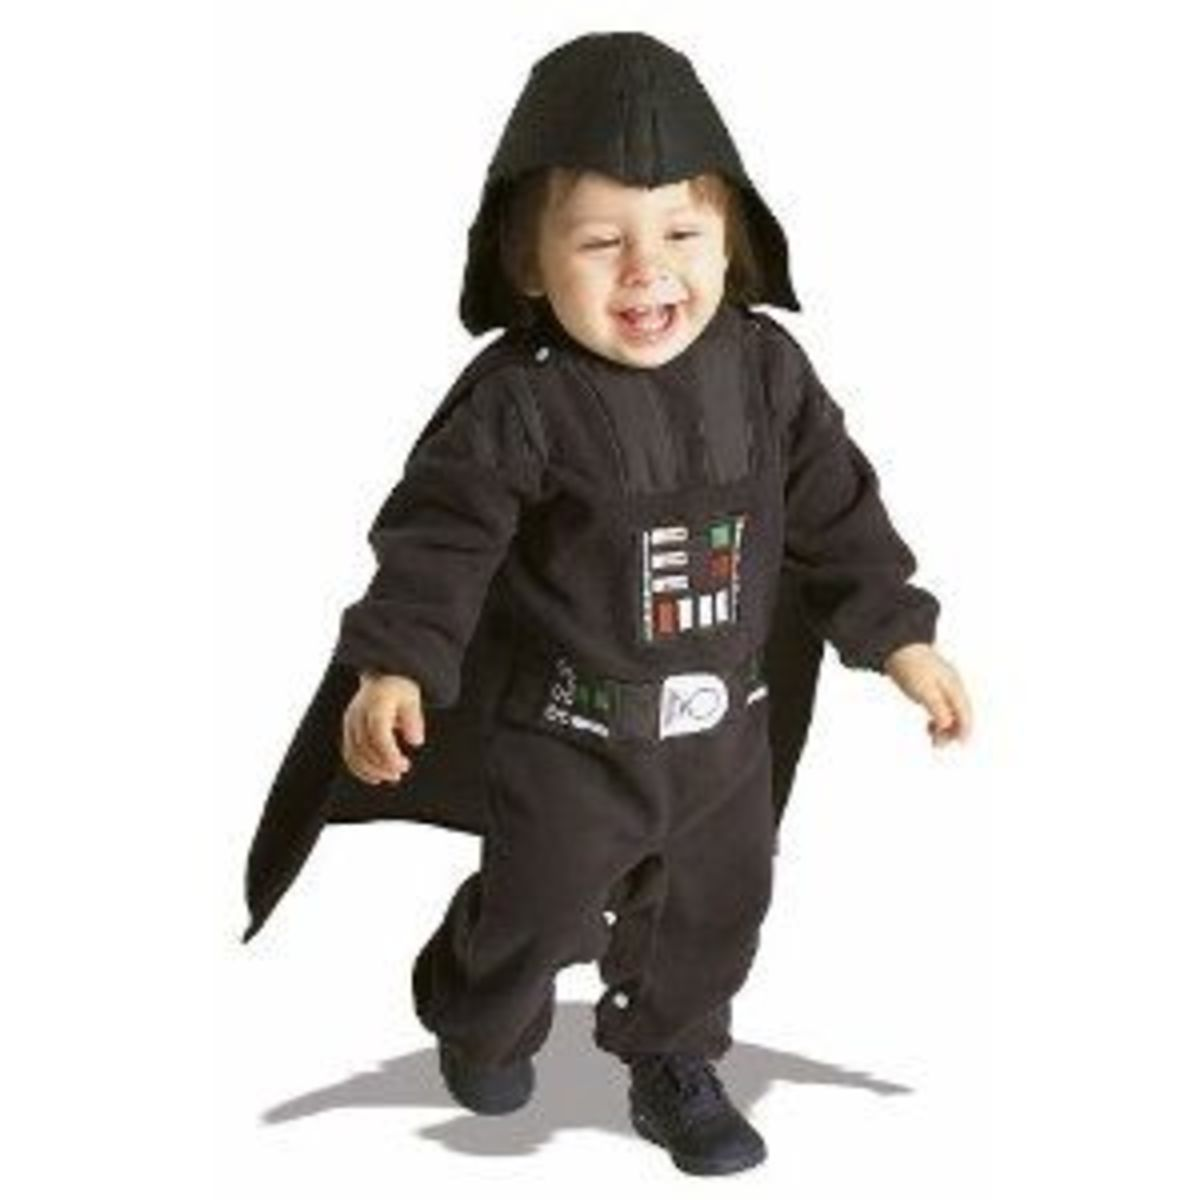 Baby Darth VaderTM Costume